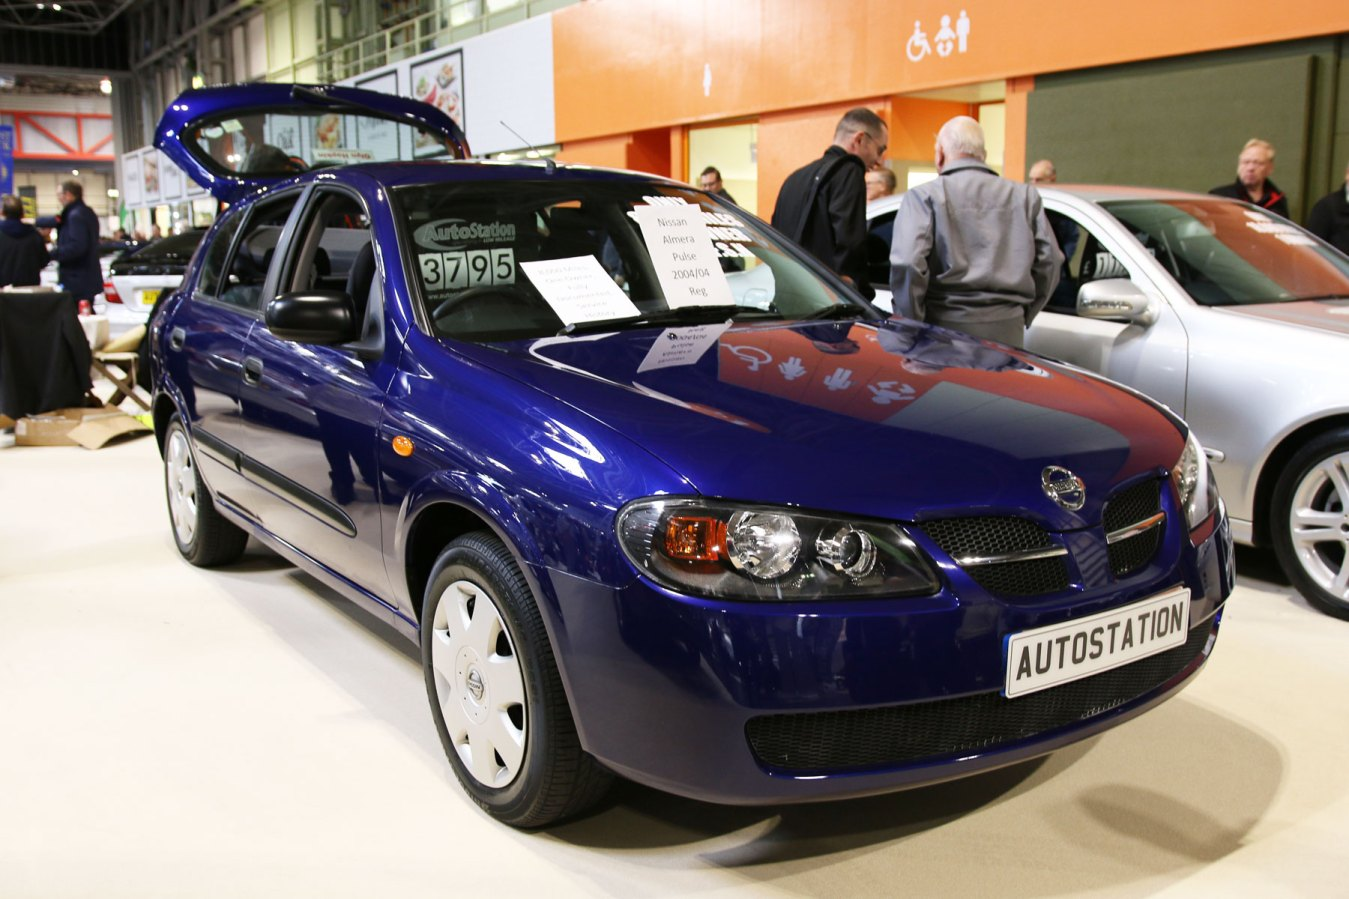 Nissan Almera: £3,795